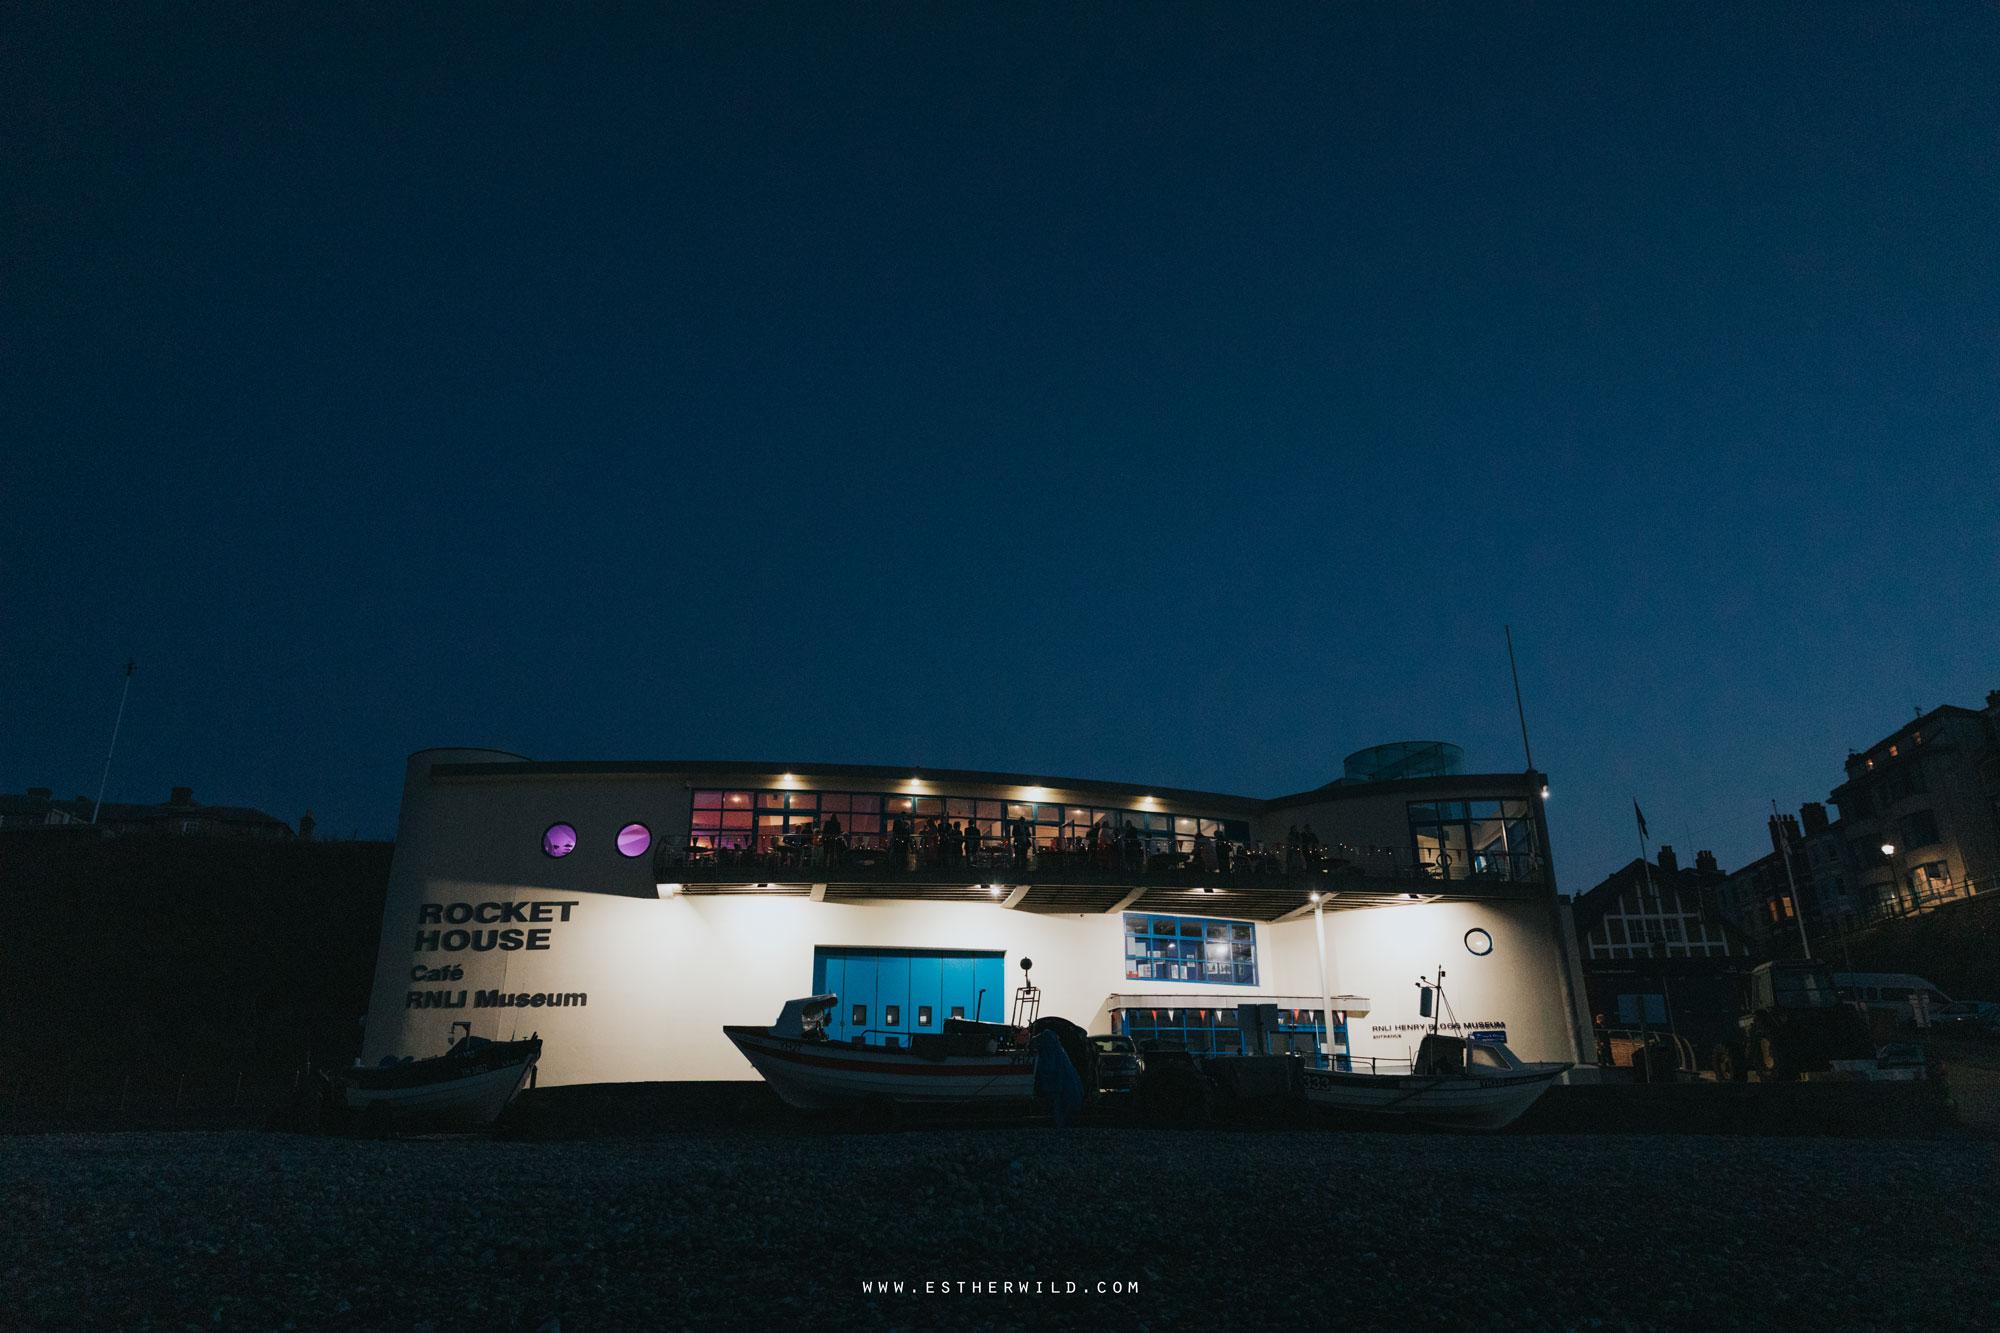 Cromer_Wedding_Beach_Outdoor_Ceremony_Norfolk_North_Lodge_Registry_Office_Rocket_House_Cafe_Cromer_Pier_IMG_5420.jpg